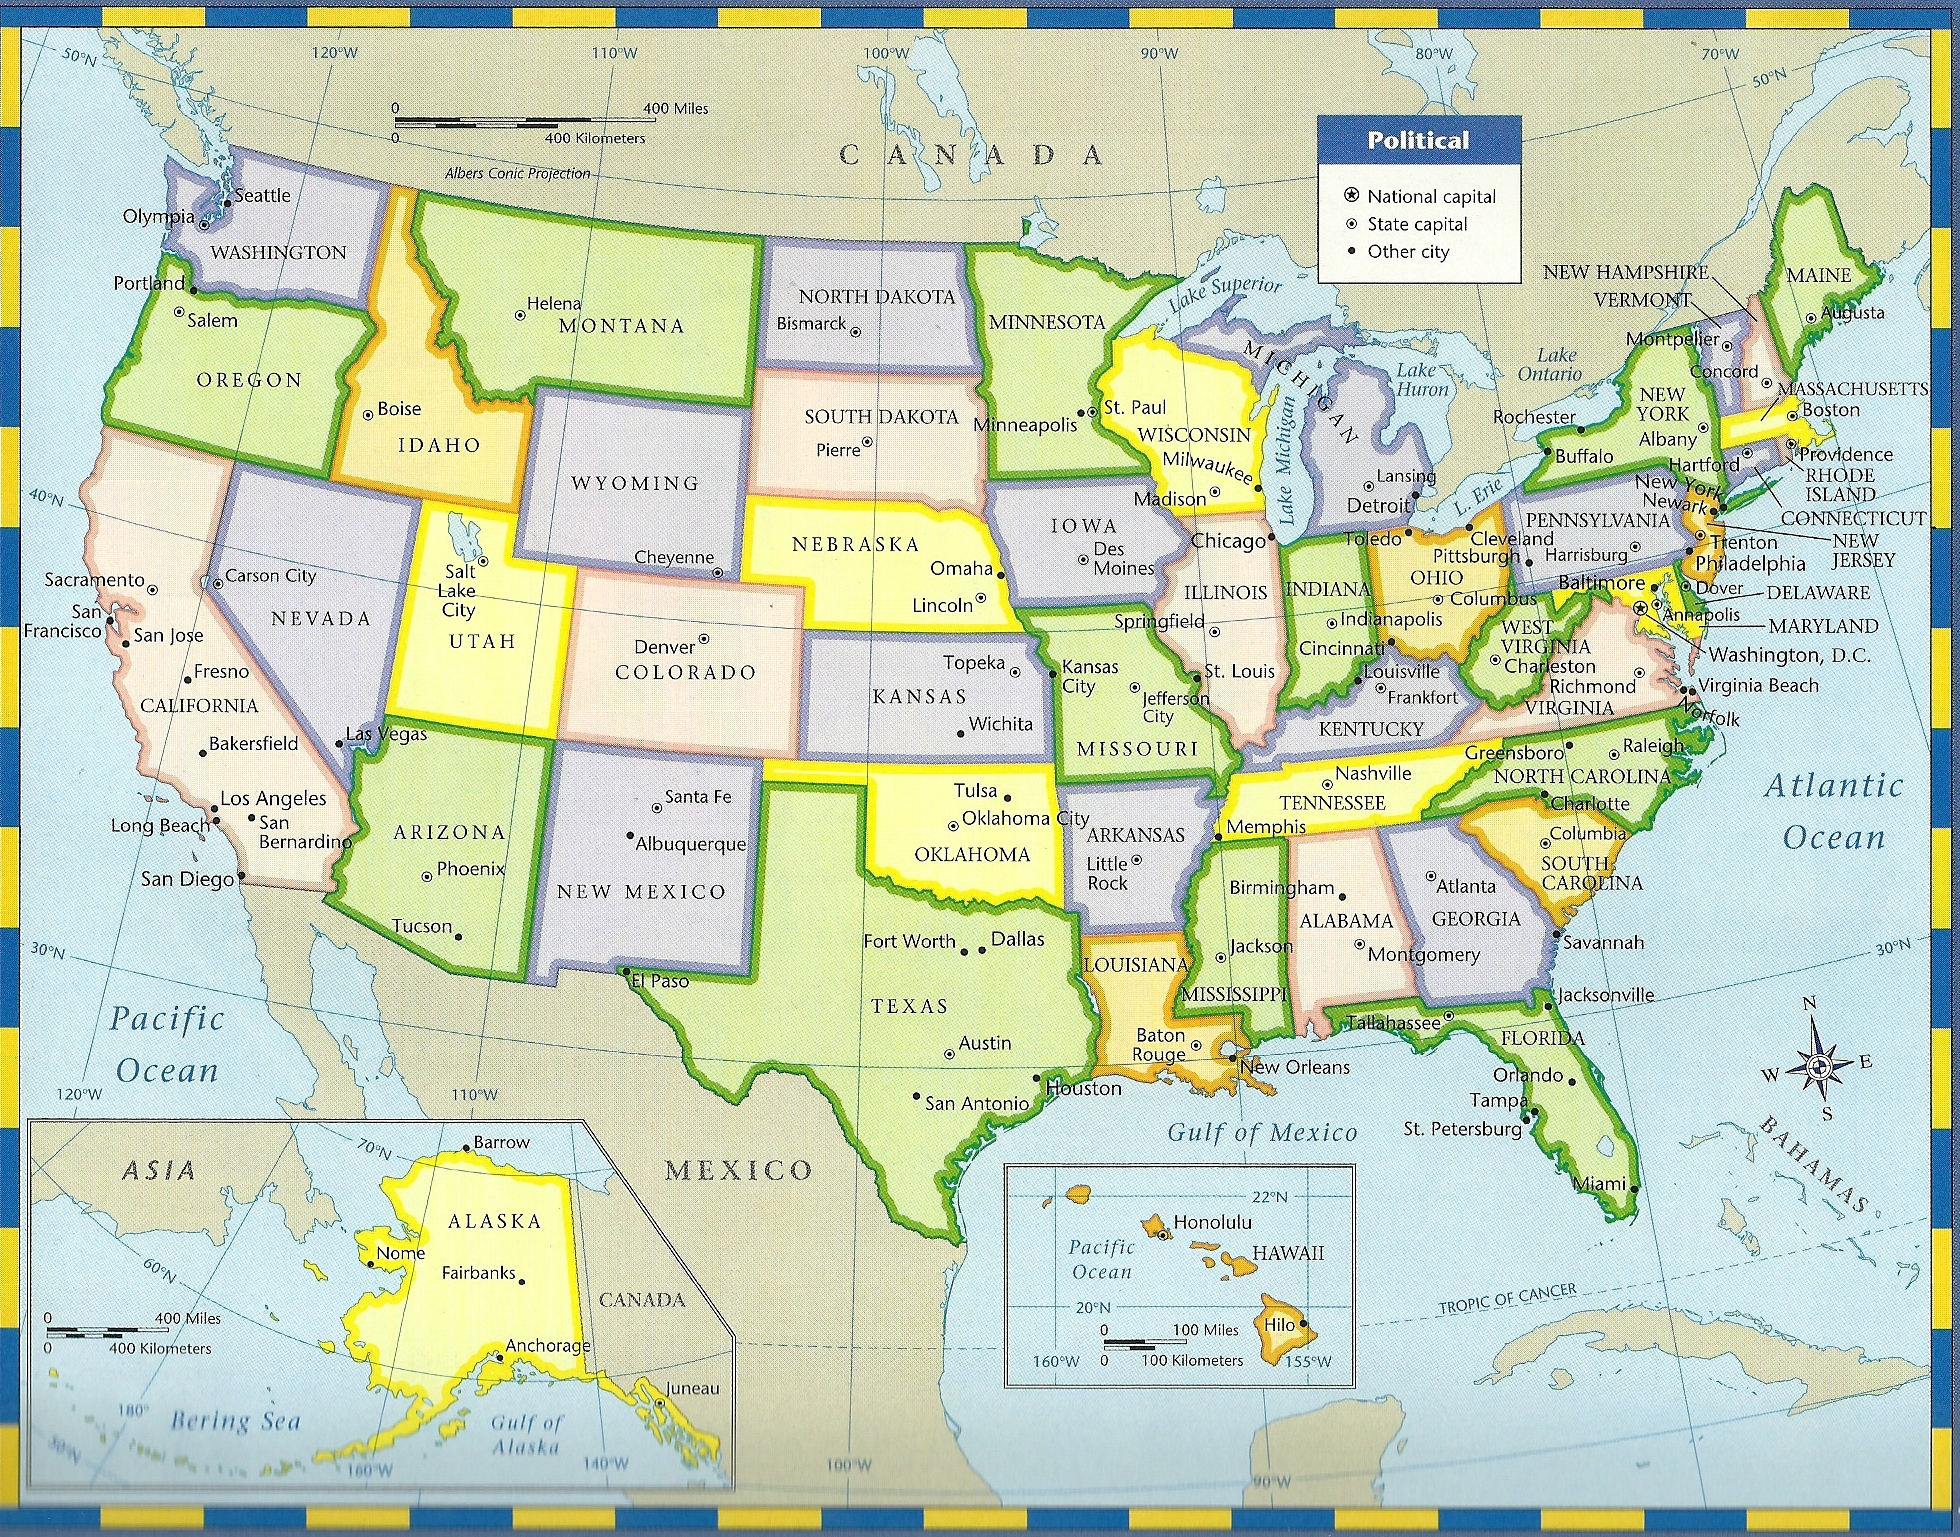 1960X1537Px Us Map Wallpaper Desktop - Wallpapersafari - Texas Map Wallpaper